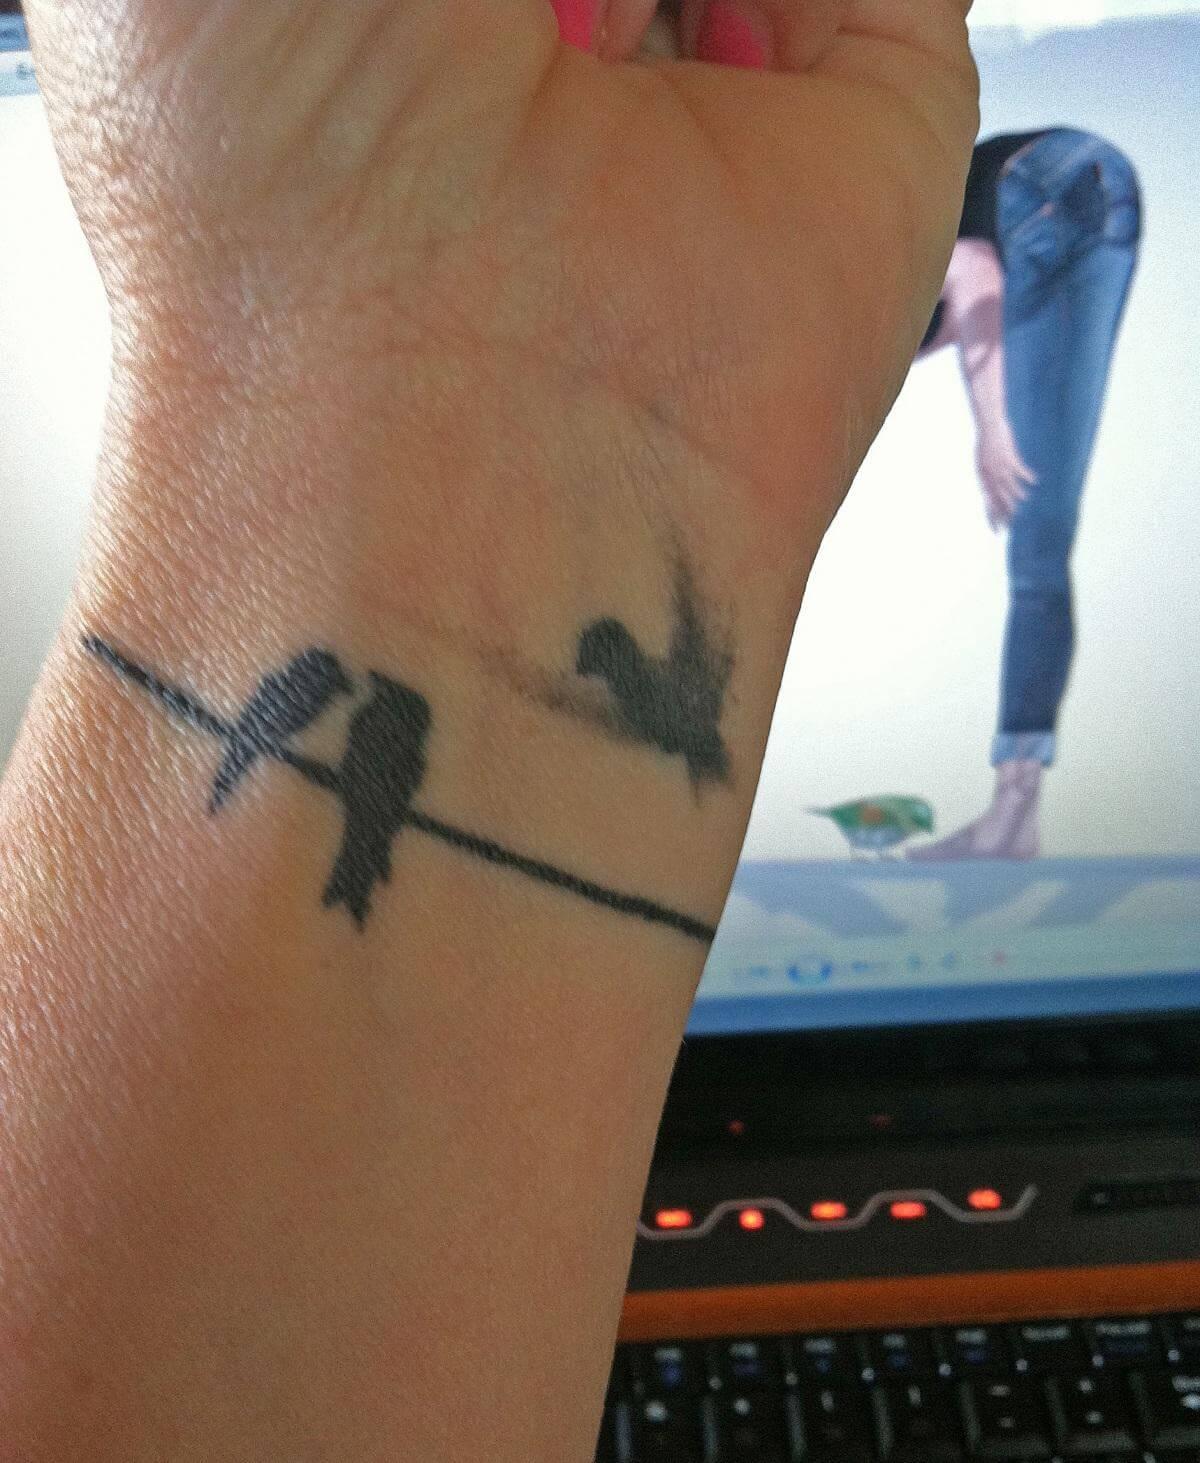 Gallery with birds on wrist tattoos tattoo designs for women for Bird tattoos on wrist